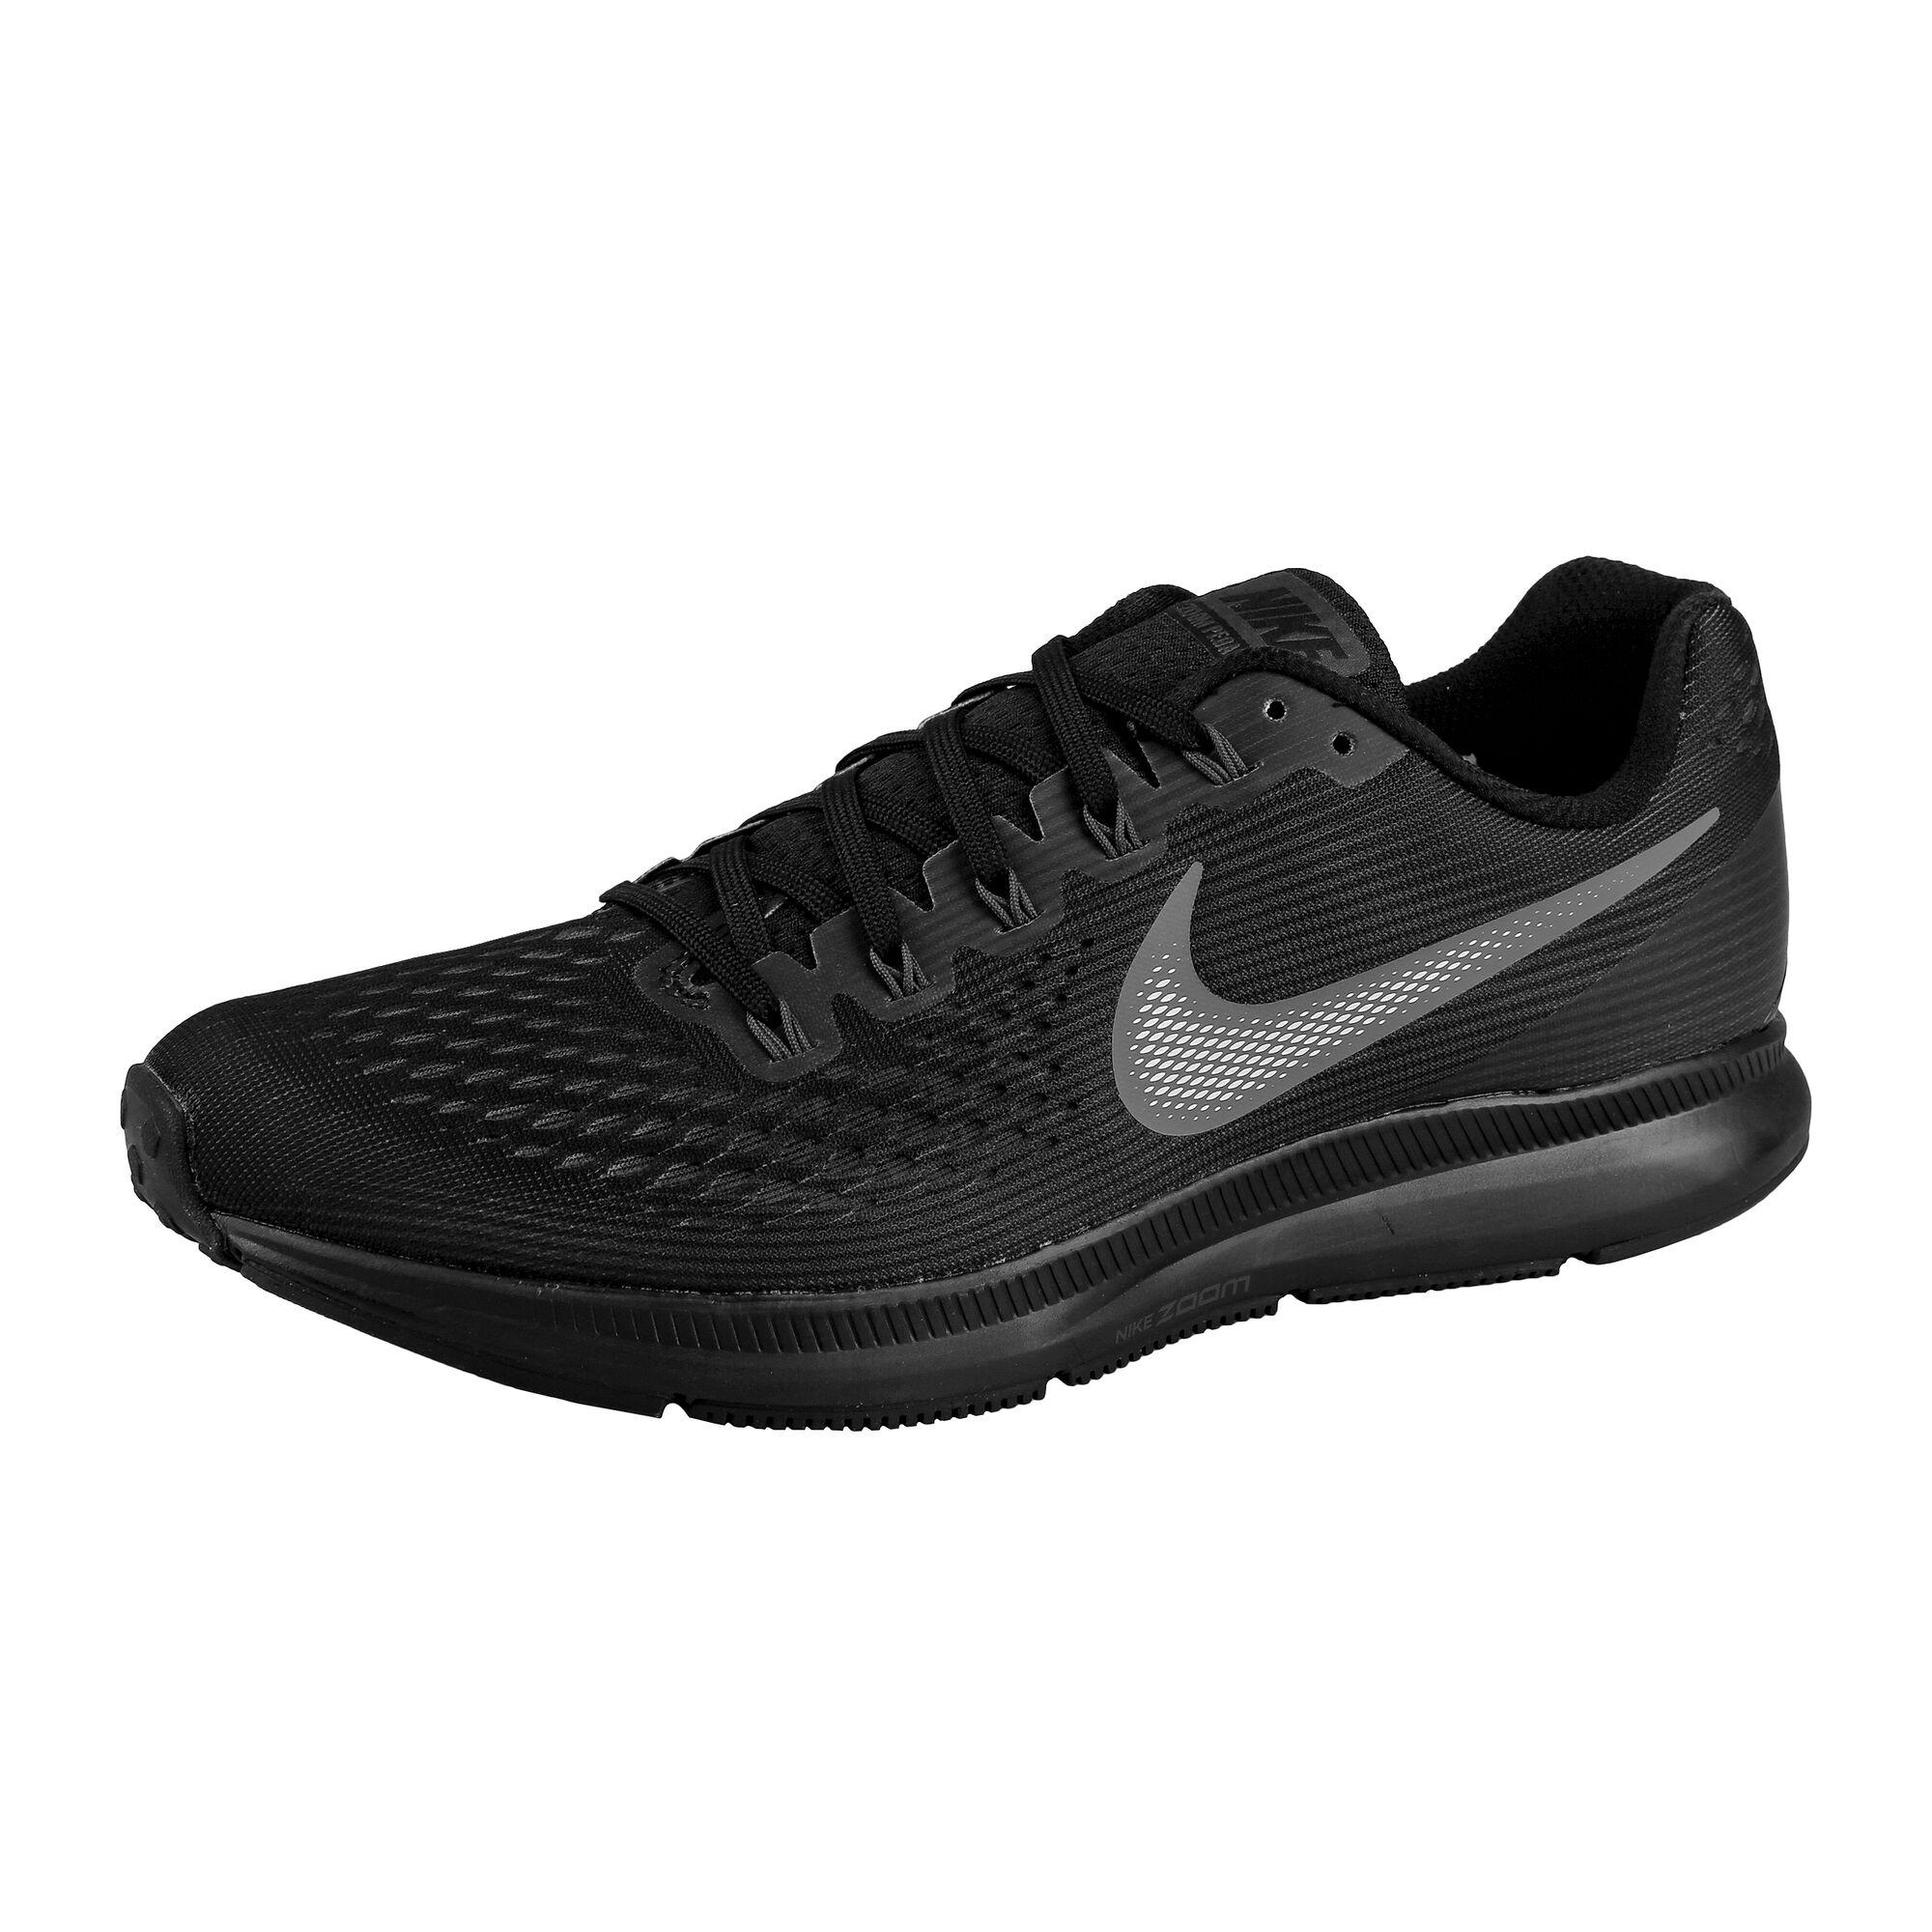 8e8db7d09c4 buy Nike Air Zoom Pegasus 34 Neutral Running Shoe Men - Black